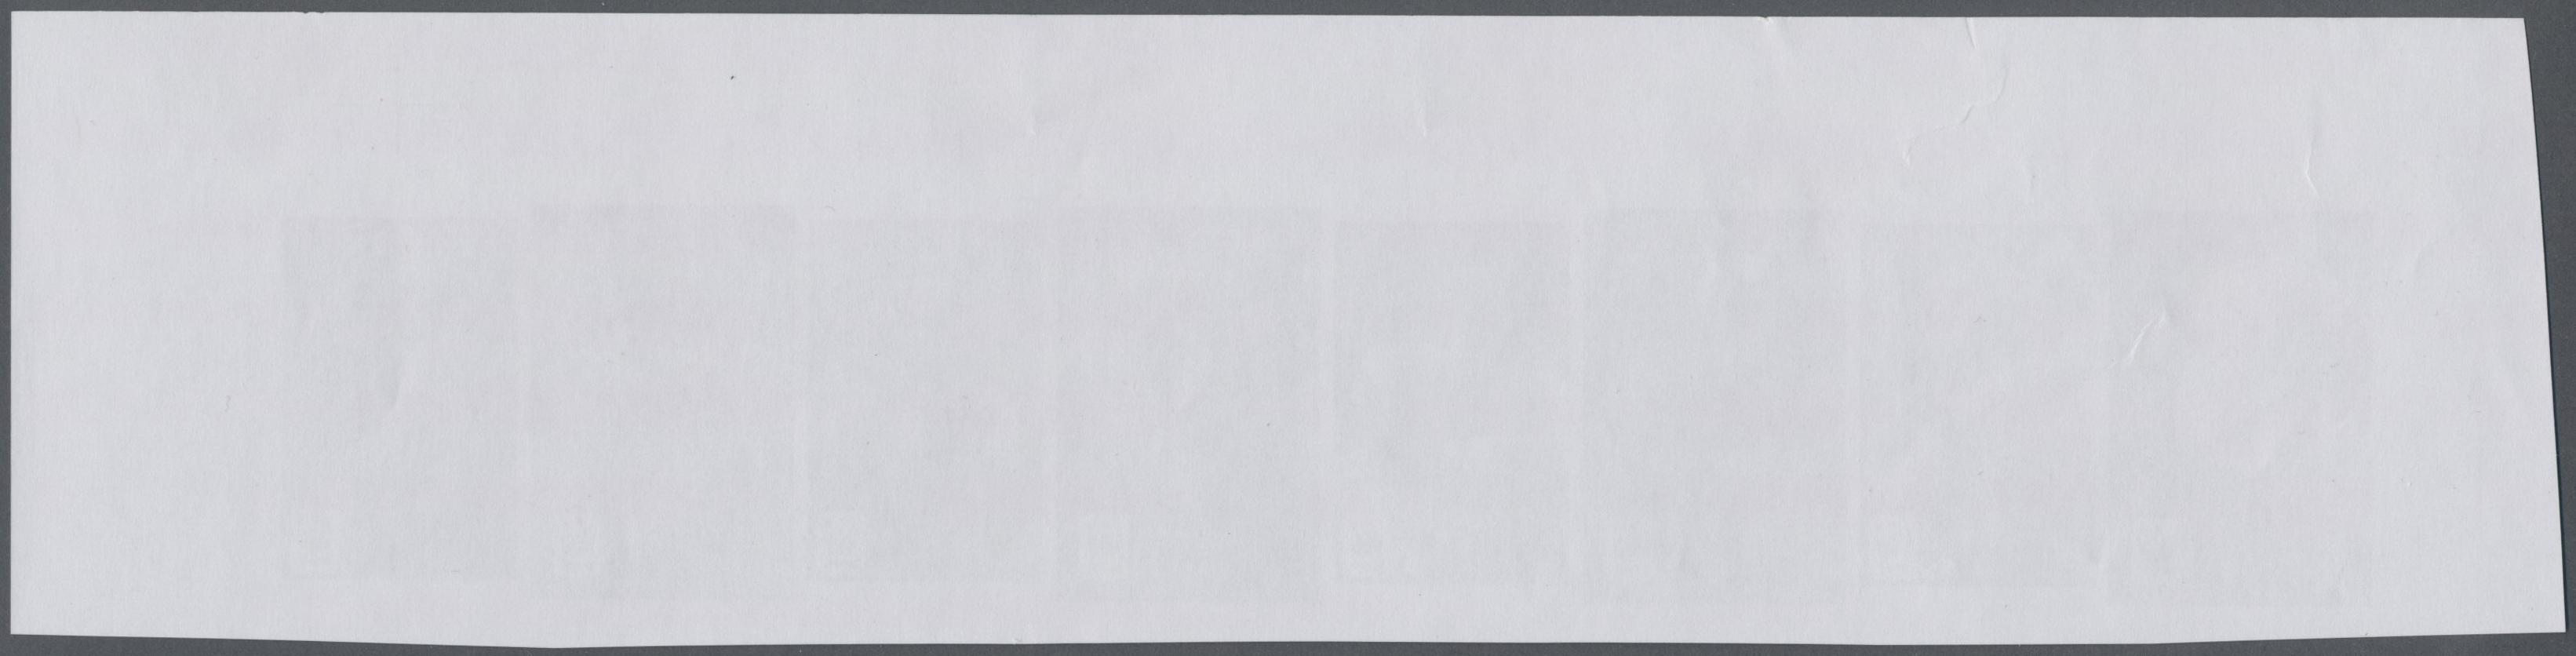 Lot 10294 - bahamas  -  Auktionshaus Christoph Gärtner GmbH & Co. KG Sale #45- ASIA/OVERSEAS/EUROPE